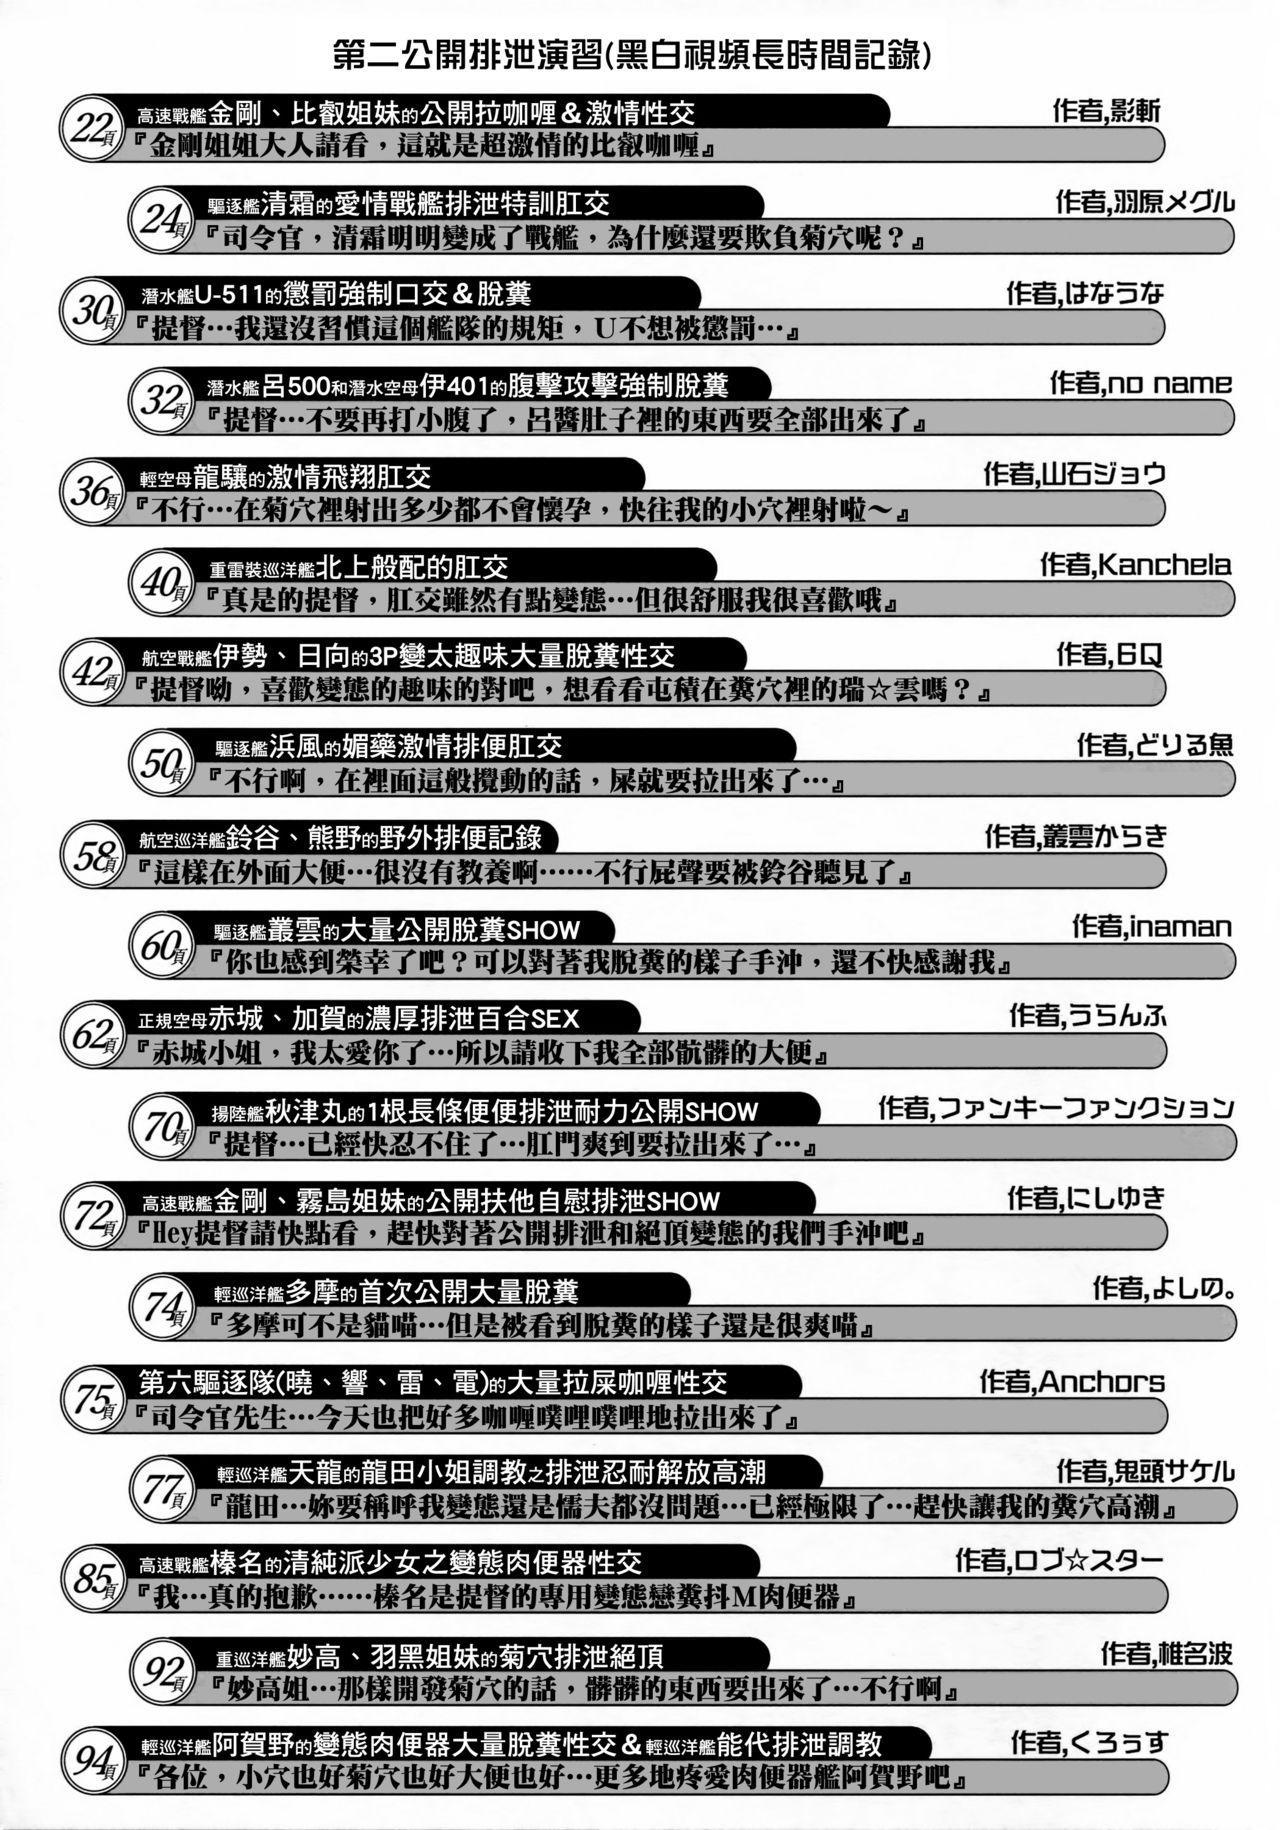 KanColle Haisetsu Sex Goudoushi LoveSca! Goudou Enshuu!! | 艦C排泄性交合同誌 激情糞便! 聯合演習!! 20